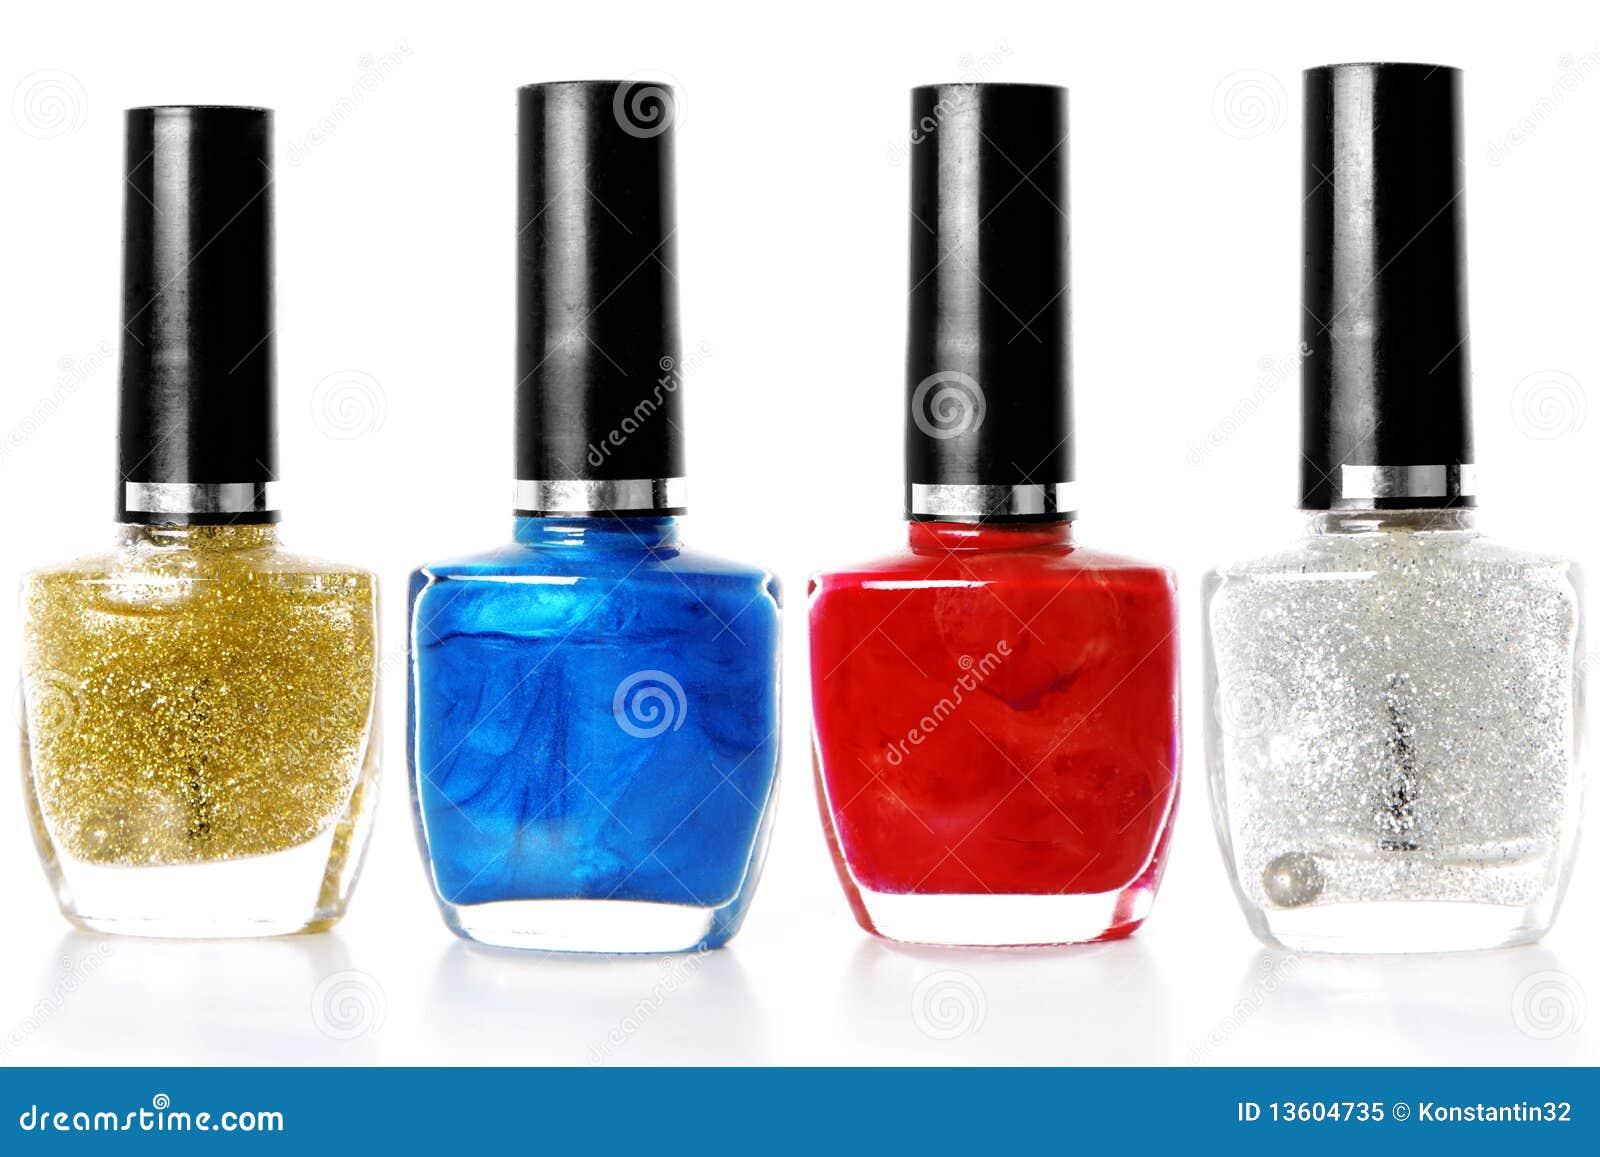 Nail polish stock image. Image of nitrocellulose, article - 13604735